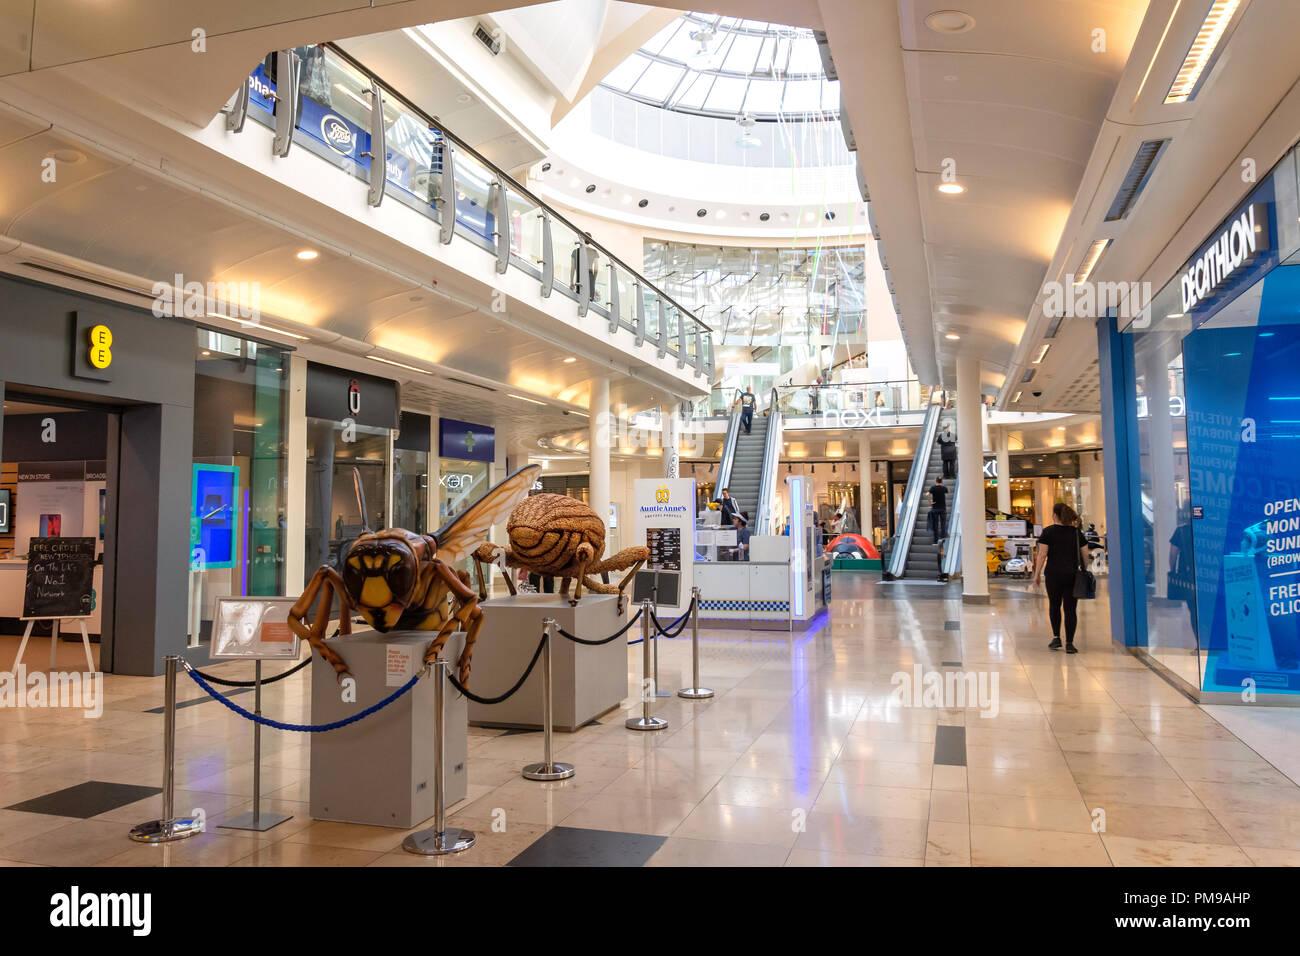 Interior of The Chimes Shopping Centre, Uxbridge, London Borough of Hillingdon, Greater London, England, United Kingdom - Stock Image